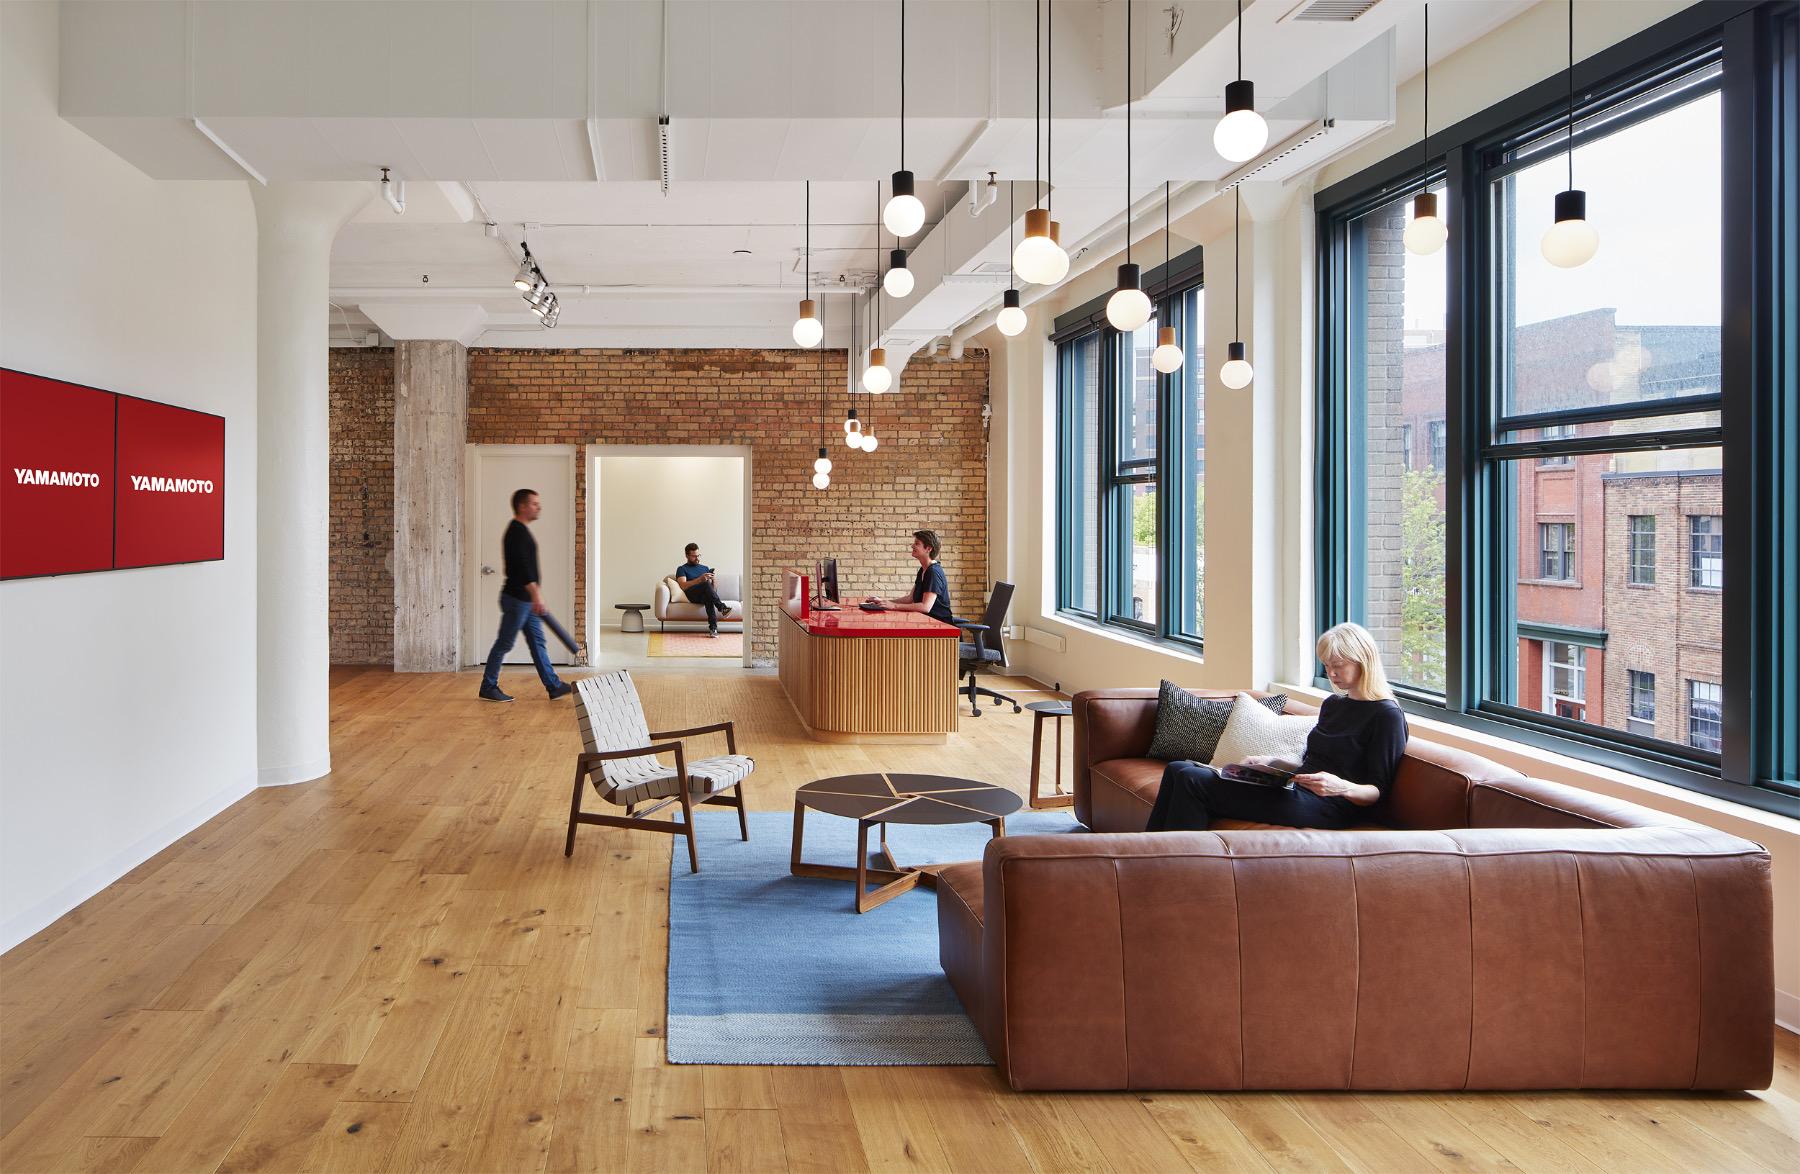 Inside Yamamoto's New Minneapolis Office